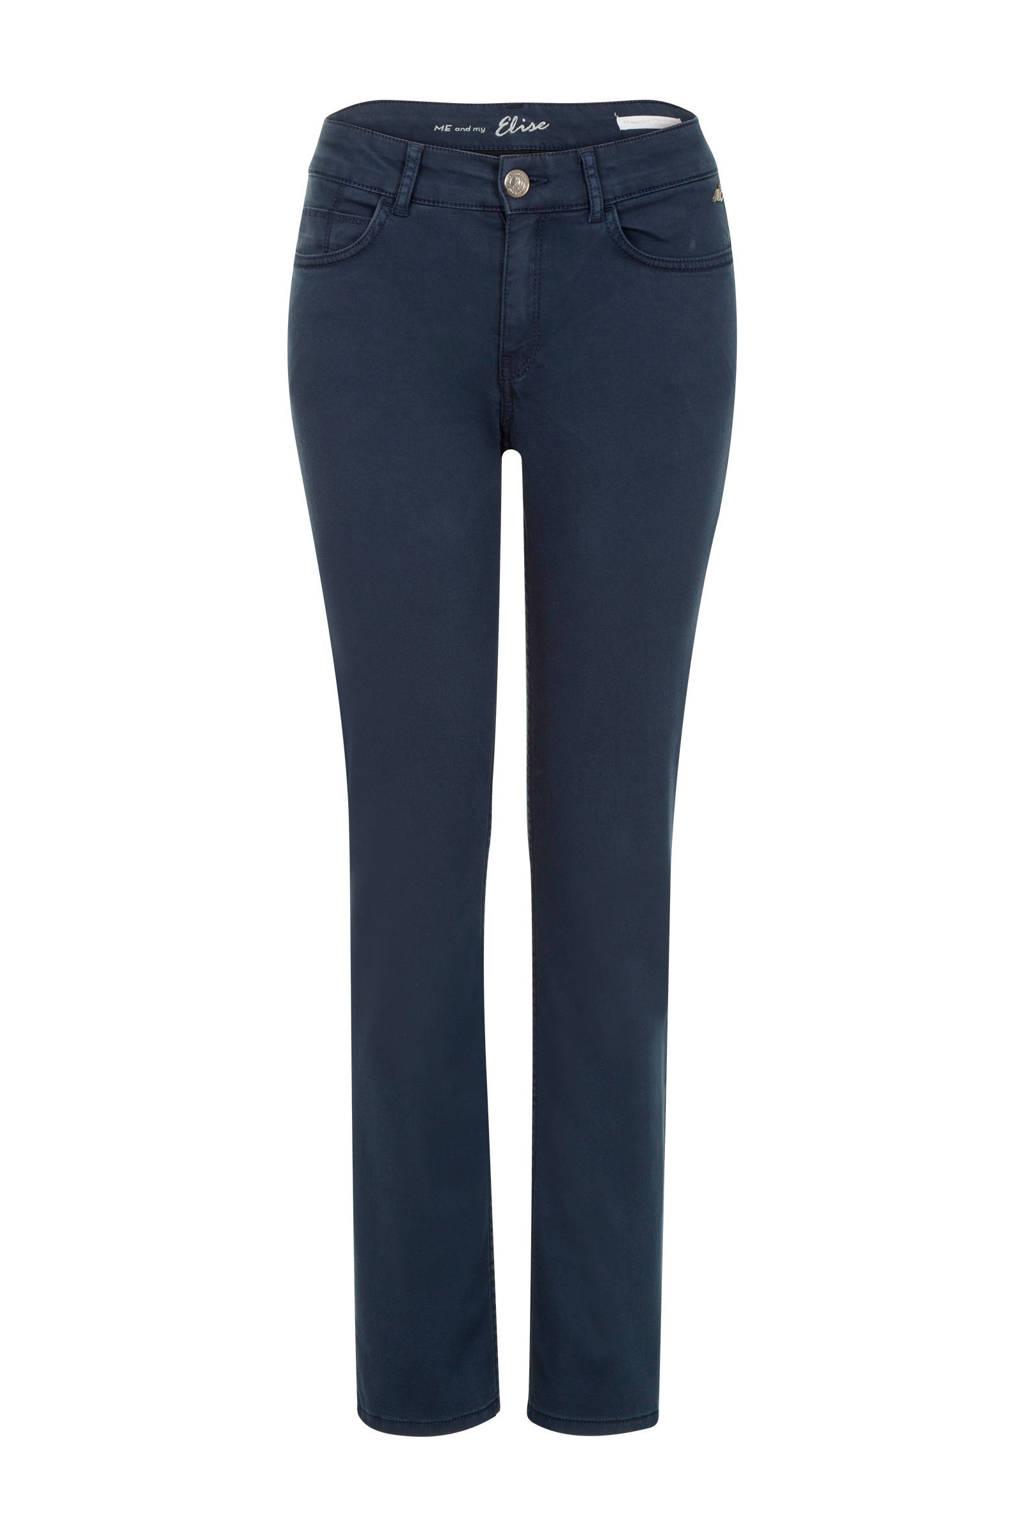 Miss Etam Regulier regular fit broek donkerblauw, Donkerblauw